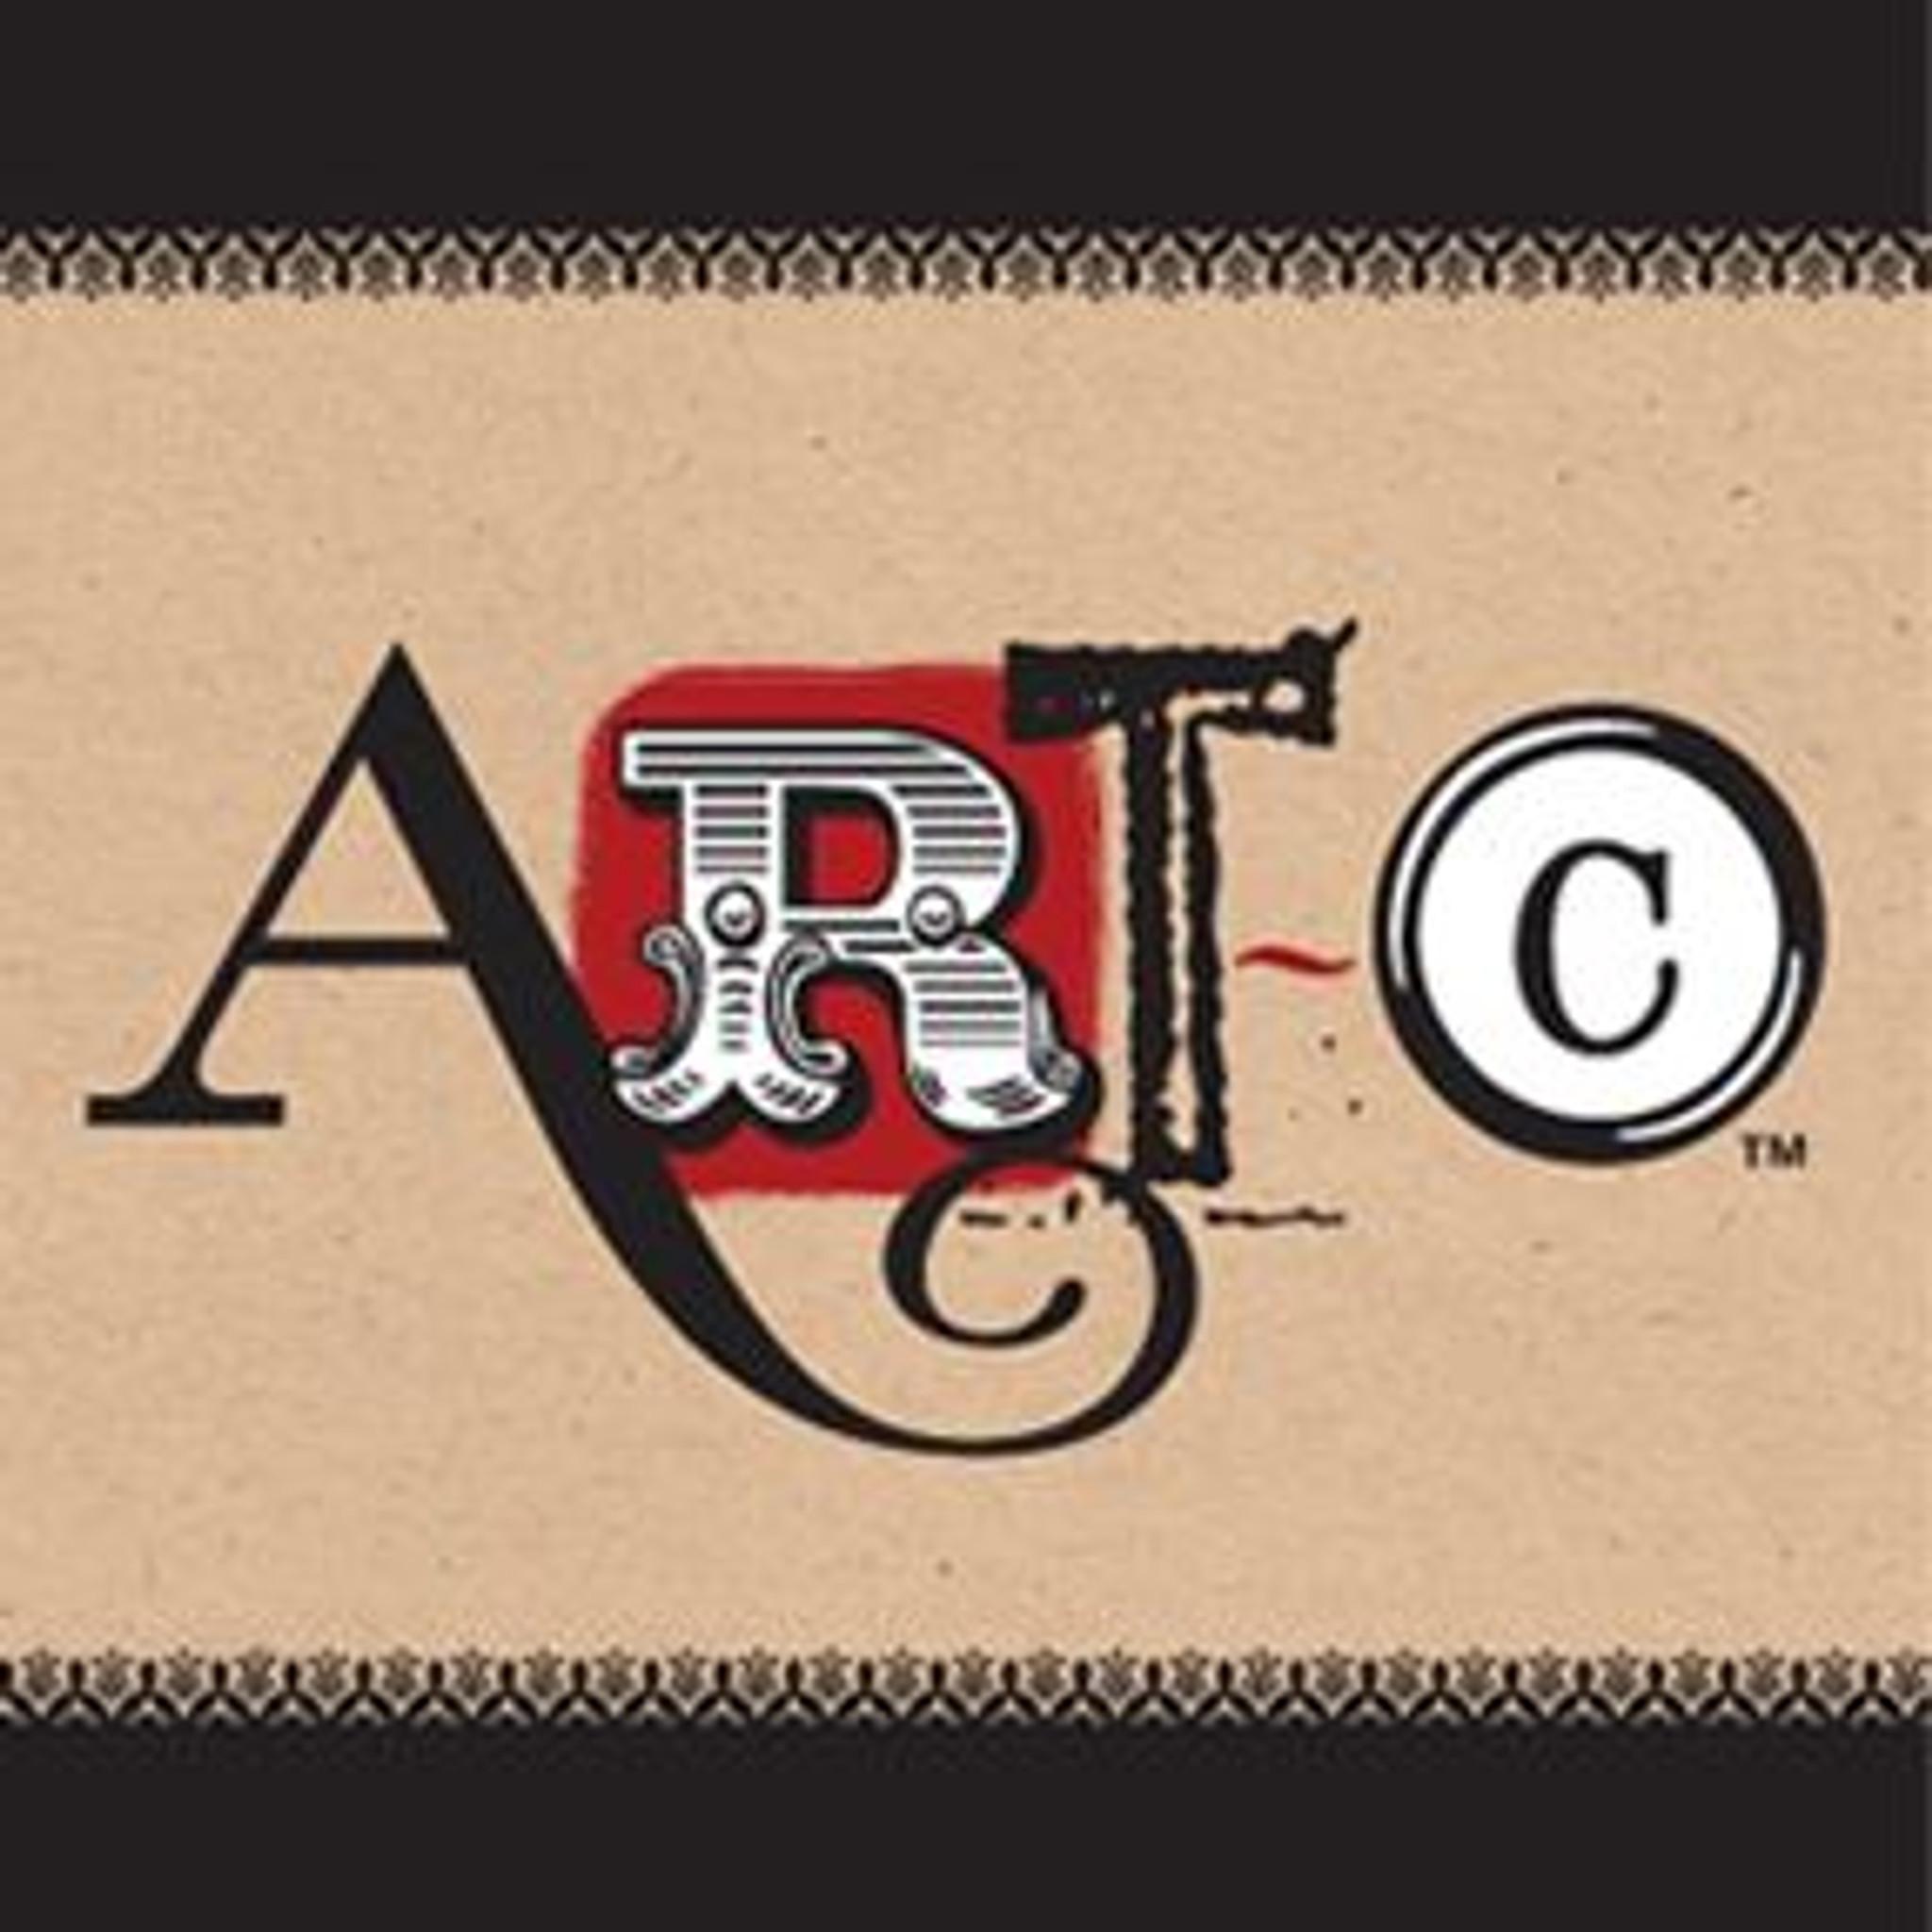 Art-C